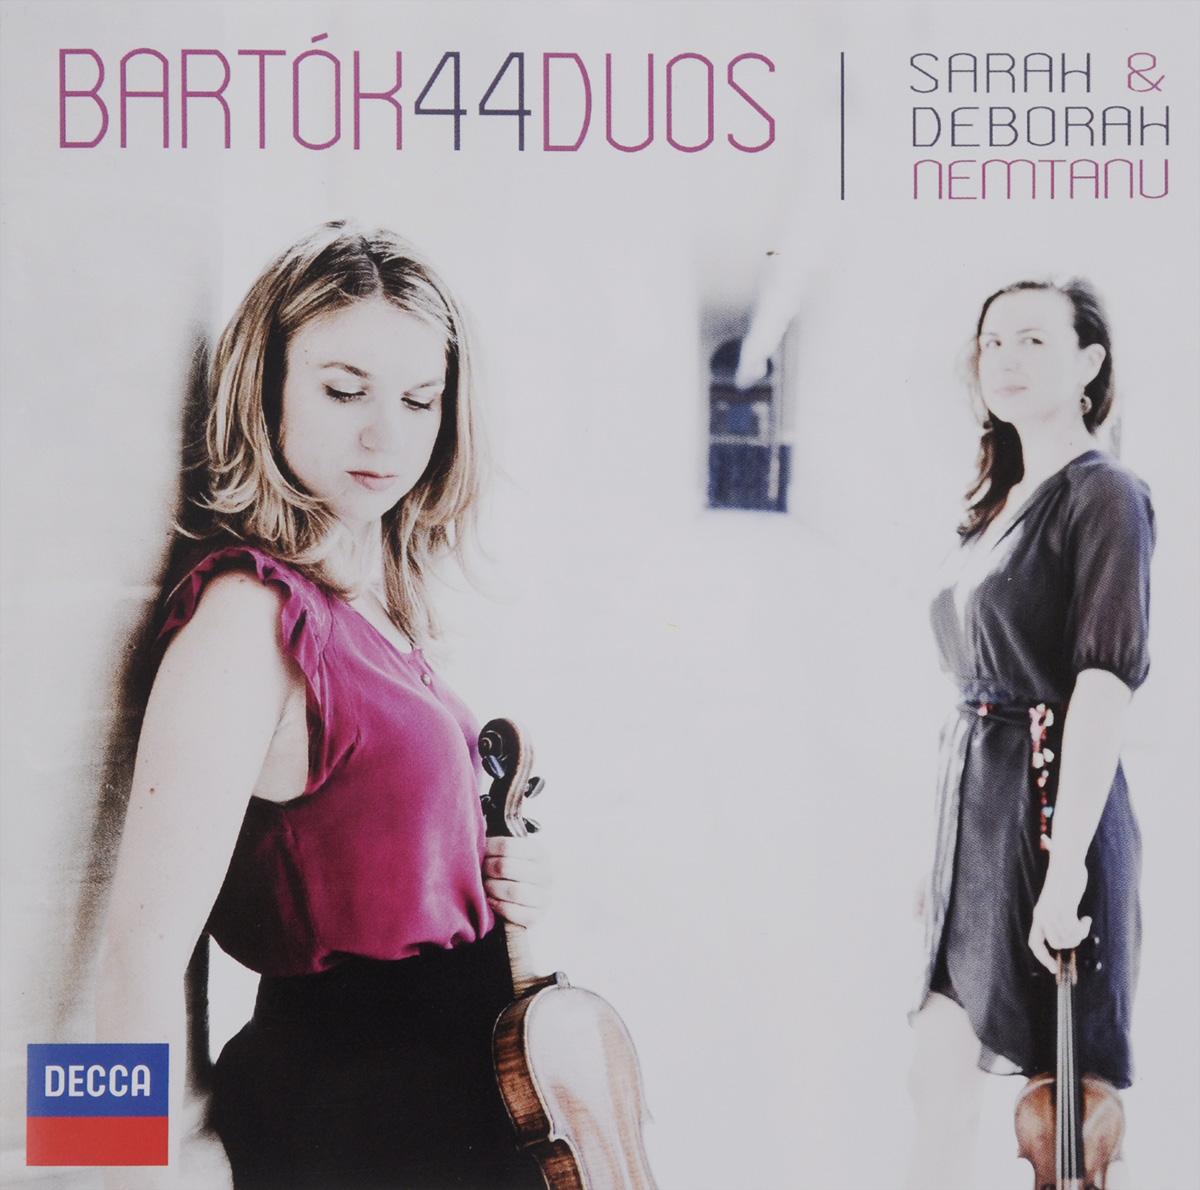 Sarah Nemtanu,Deborah Nemtanu Sarah Nemtanu. Deborah Nemtanu. Bartok. 44 Duos For Two Violins deborah atkinson heart strings